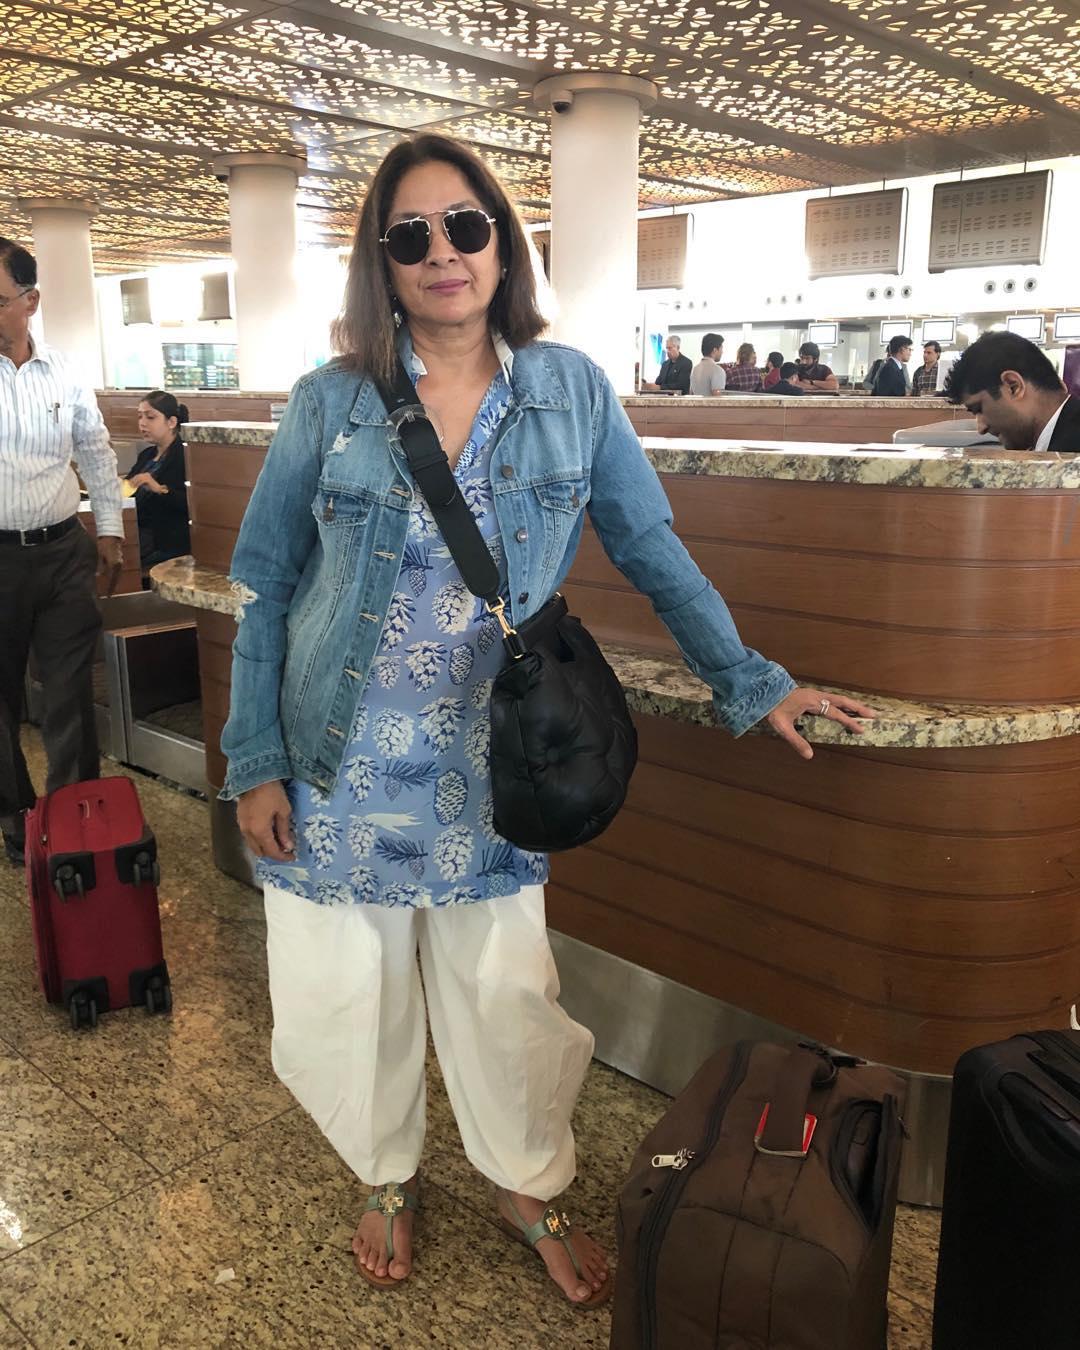 Neena Gupta does not wanted to do choli ke peeche kya hai